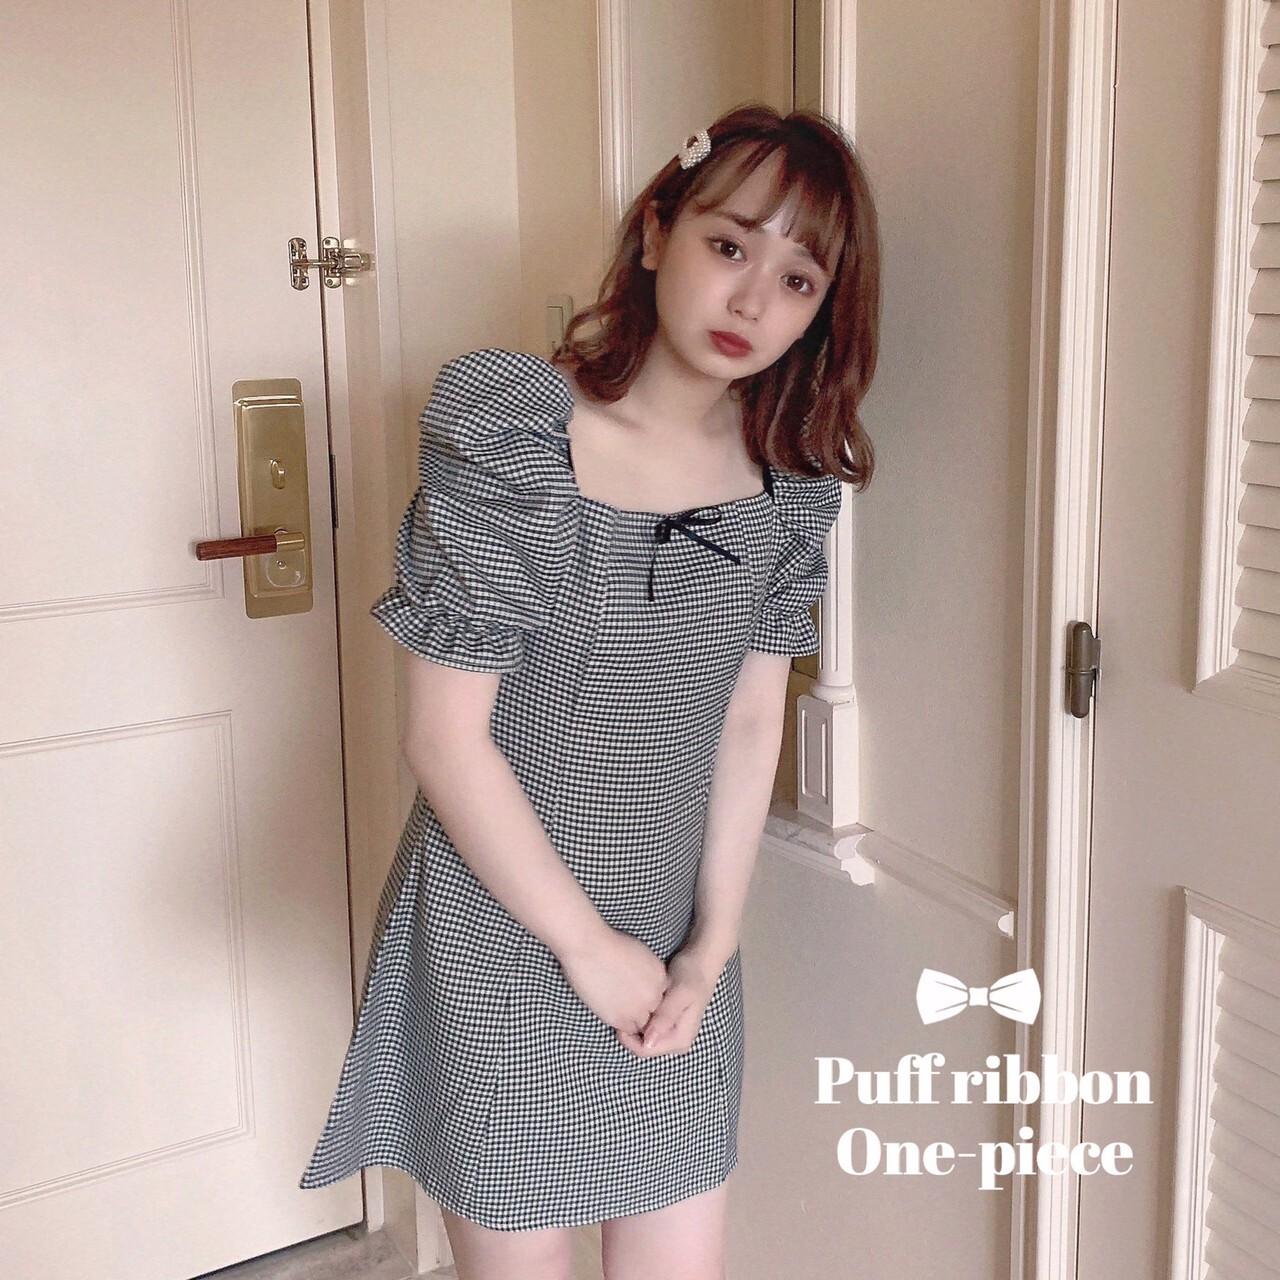 【meltie】puff ribbon one-piece